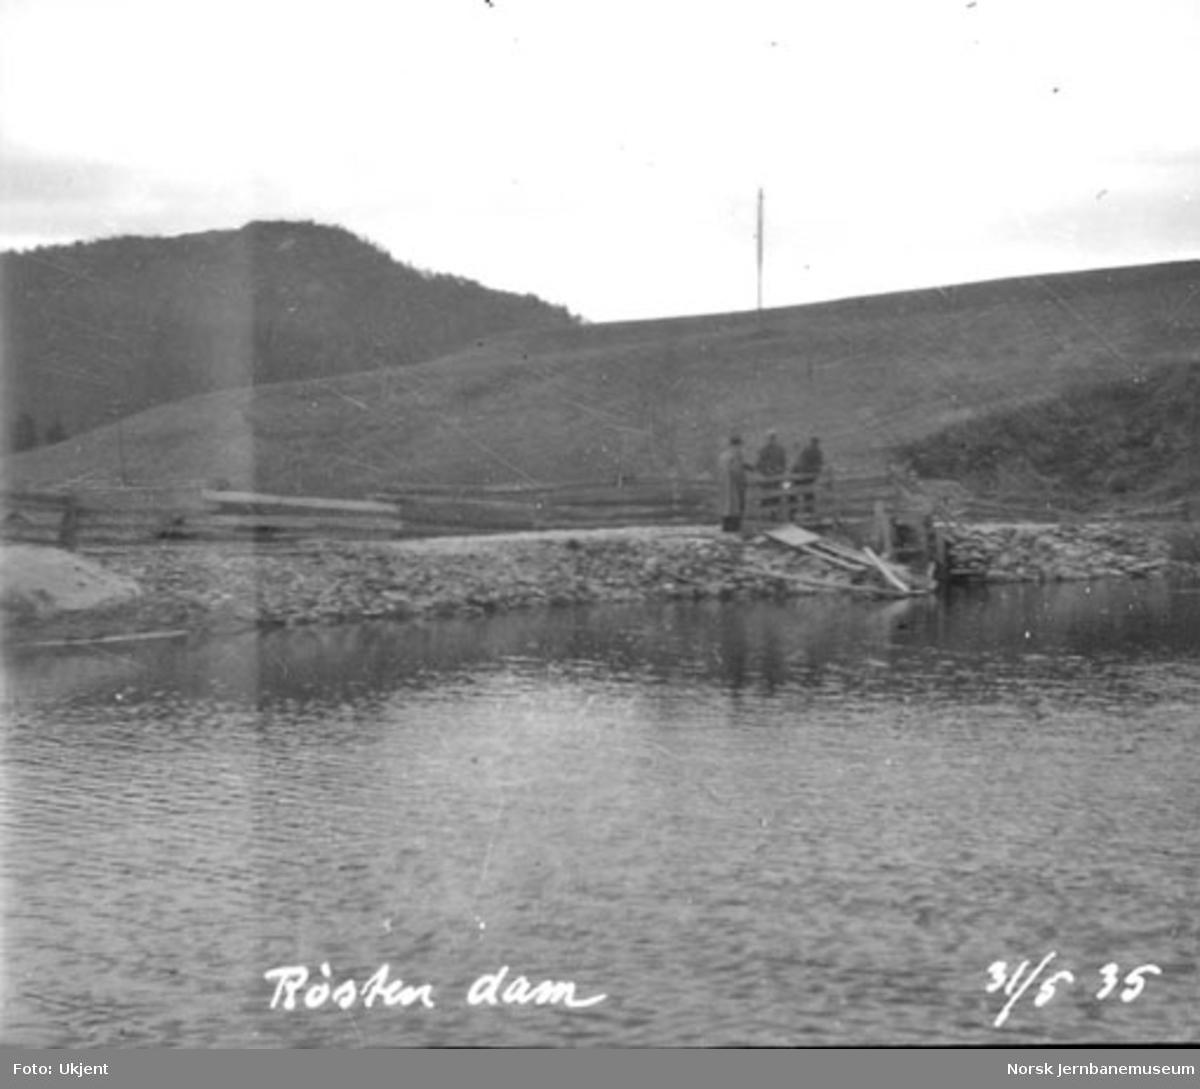 Røsten dam